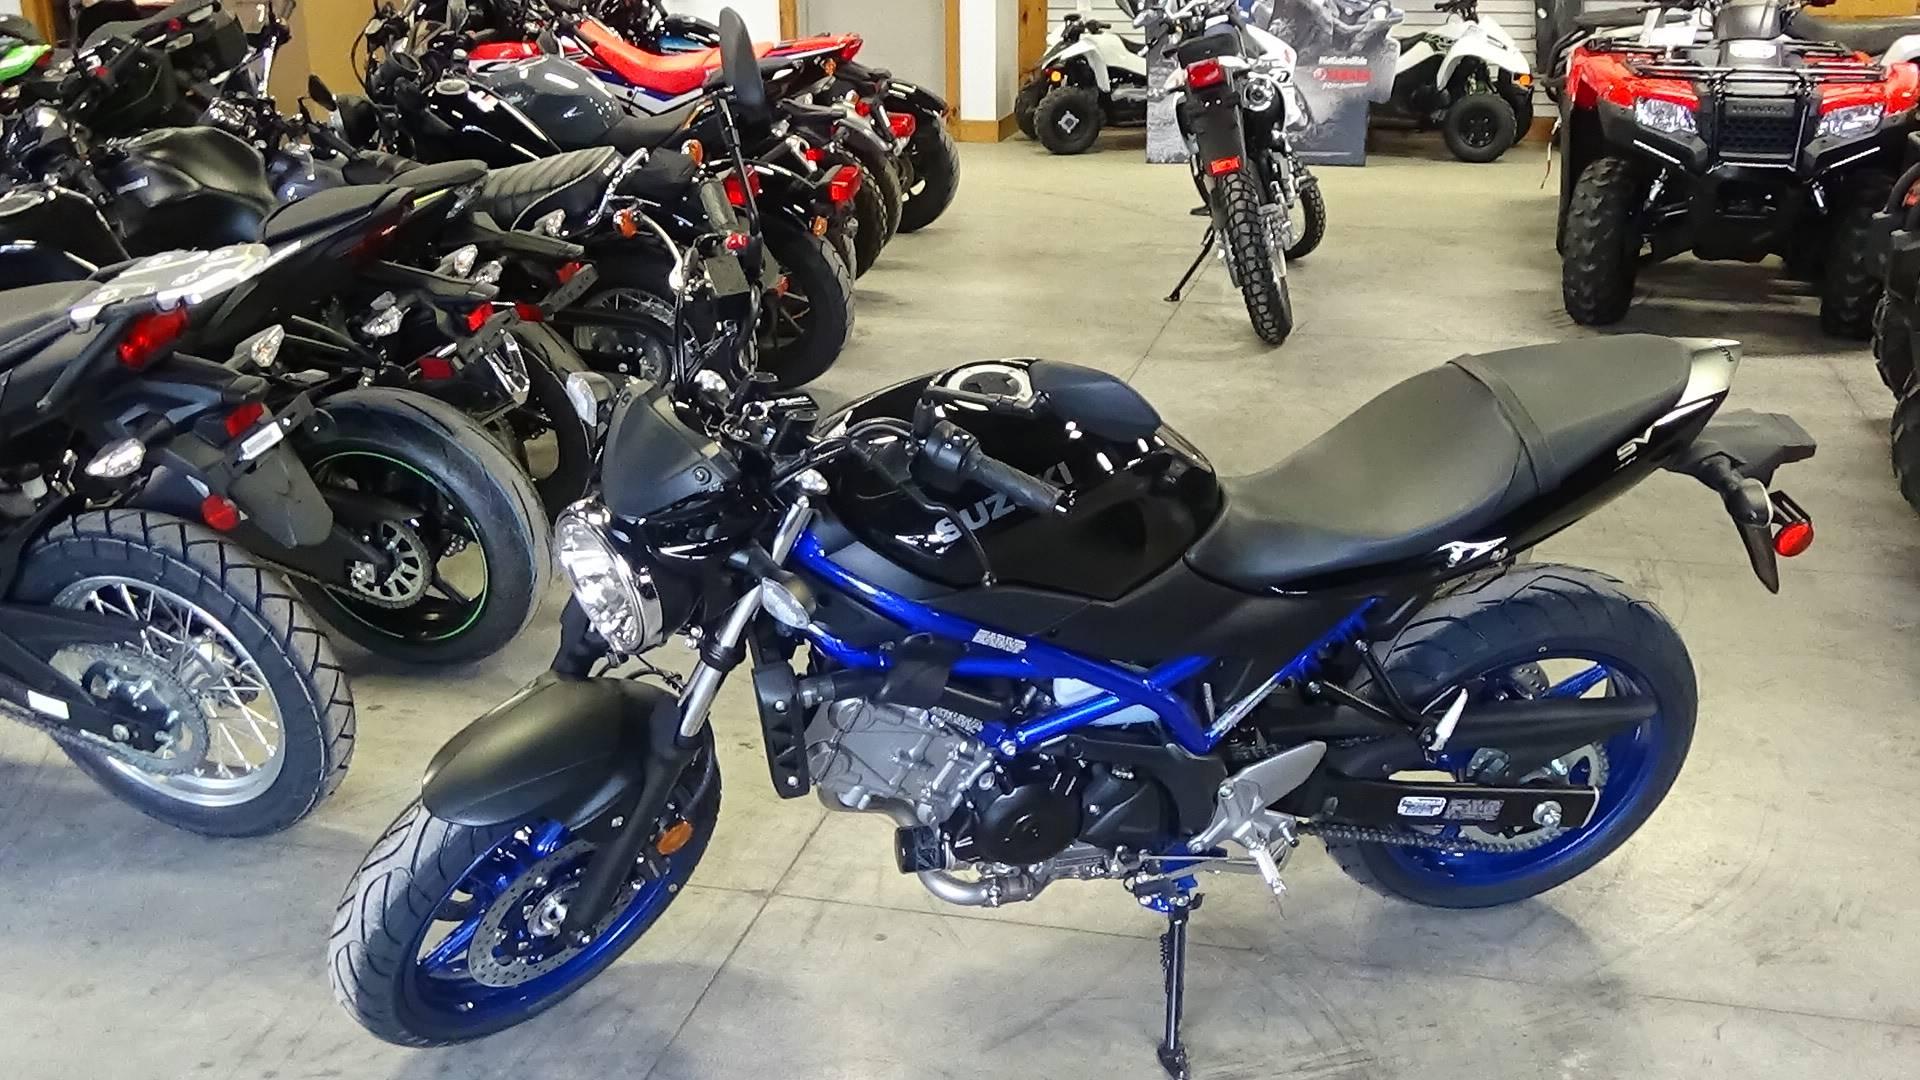 New 2019 Suzuki SV650 ABS Motorcycles in Adams, MA | Stock